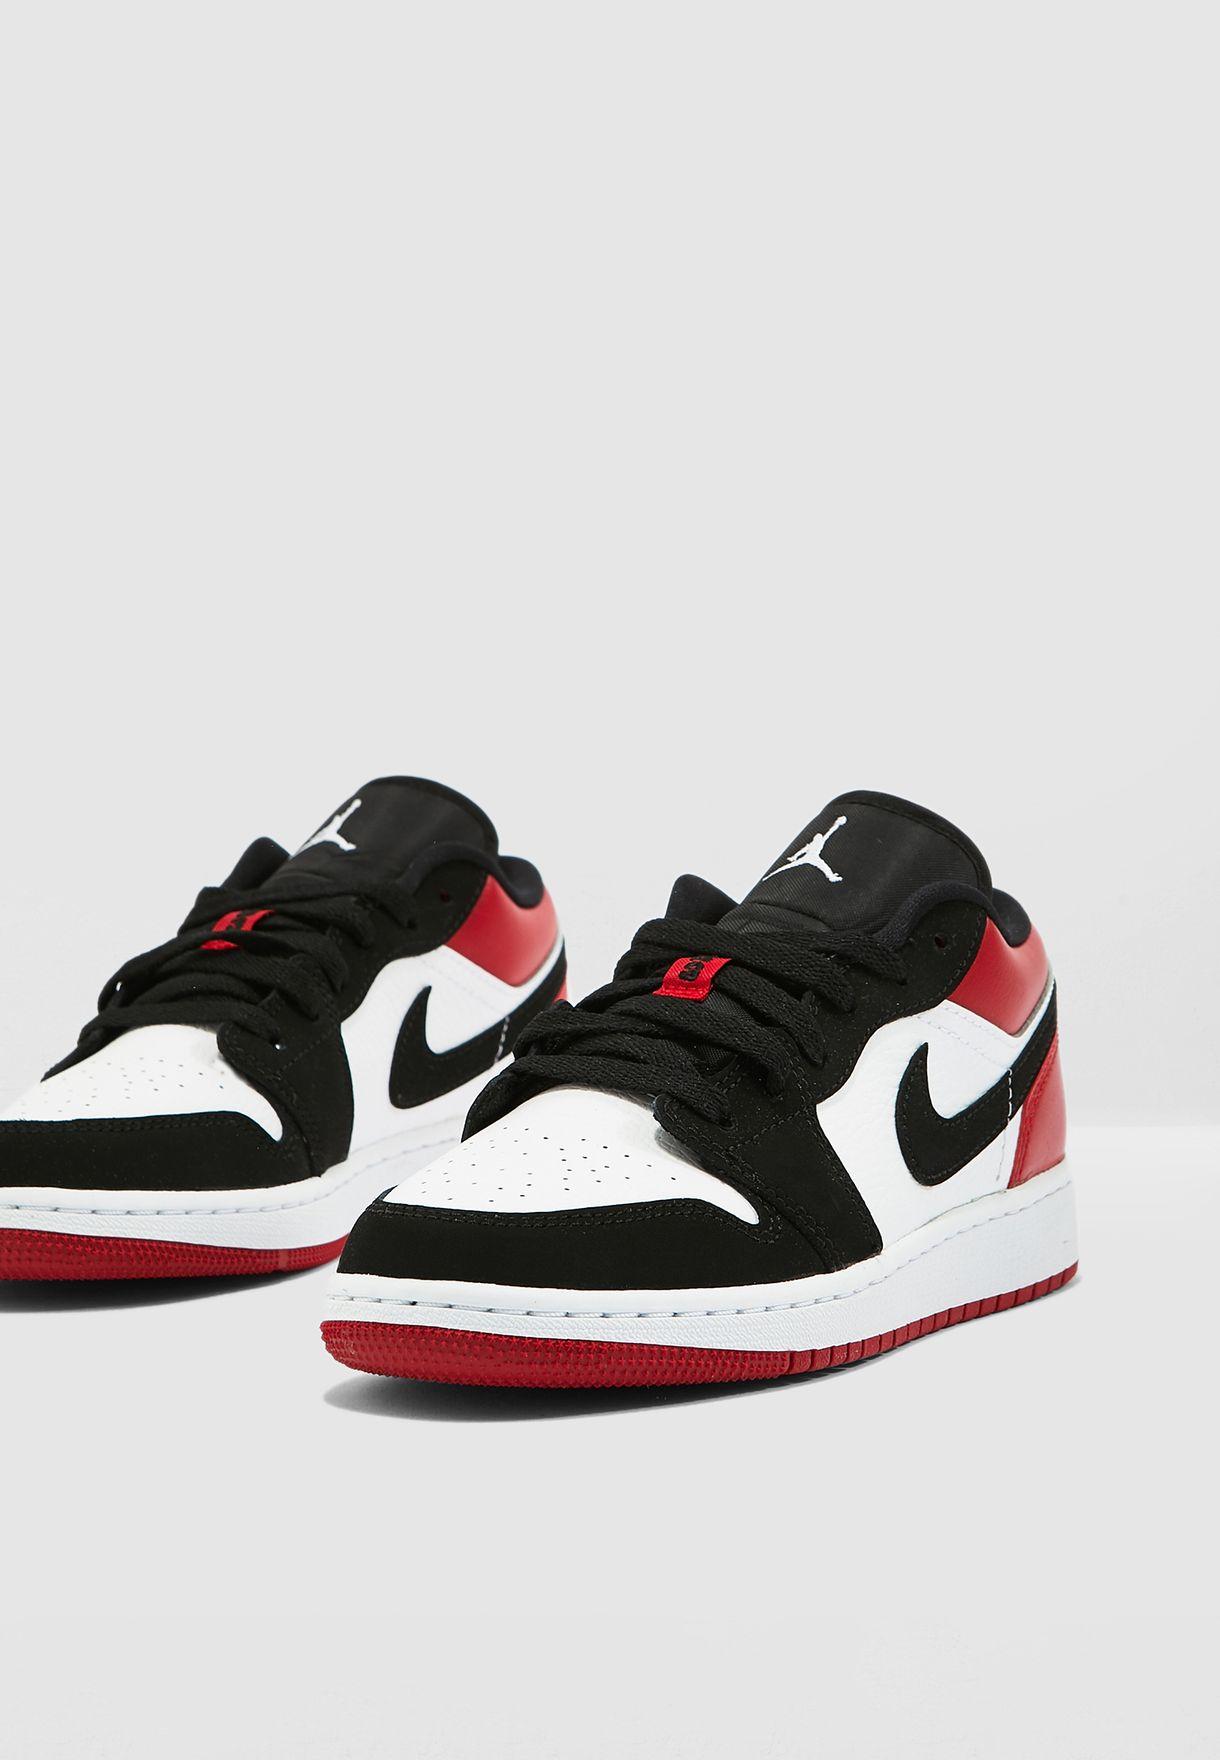 watch a52b7 39a09 Youth Air Jordan 1 Low